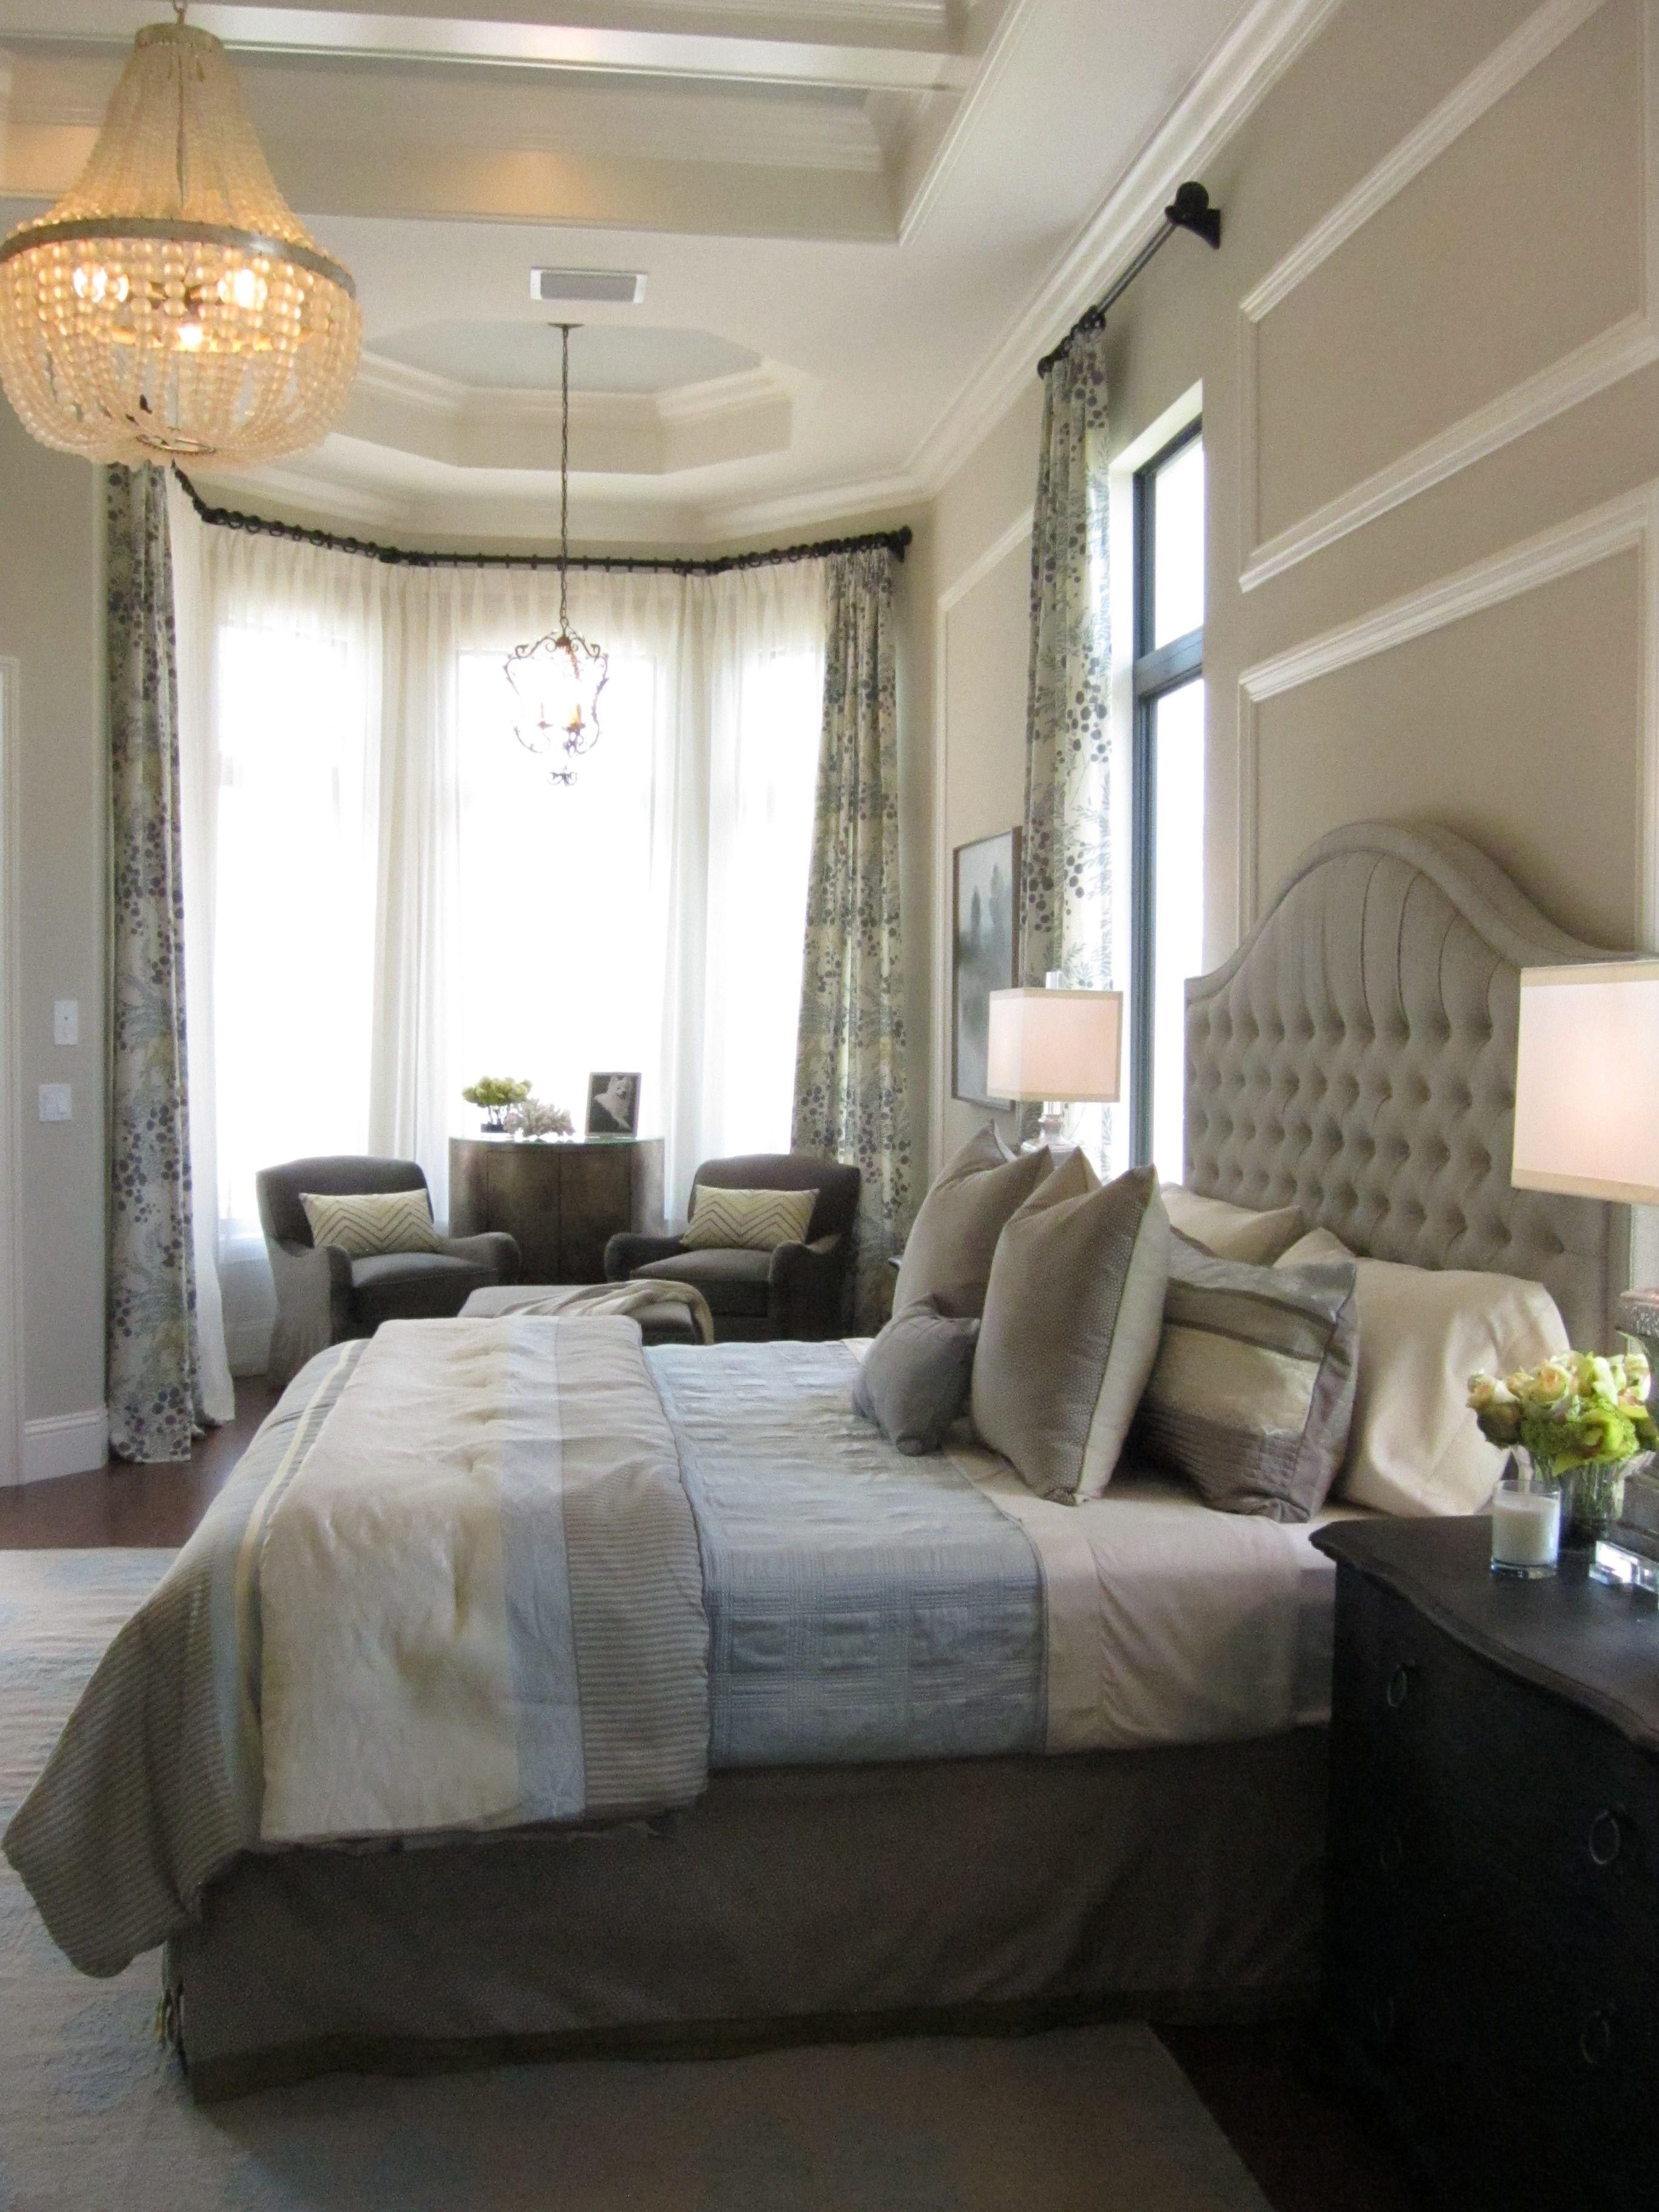 Model home design by Beasley & Henley Interior Design # ... on Model Bedroom Interior Design  id=42285